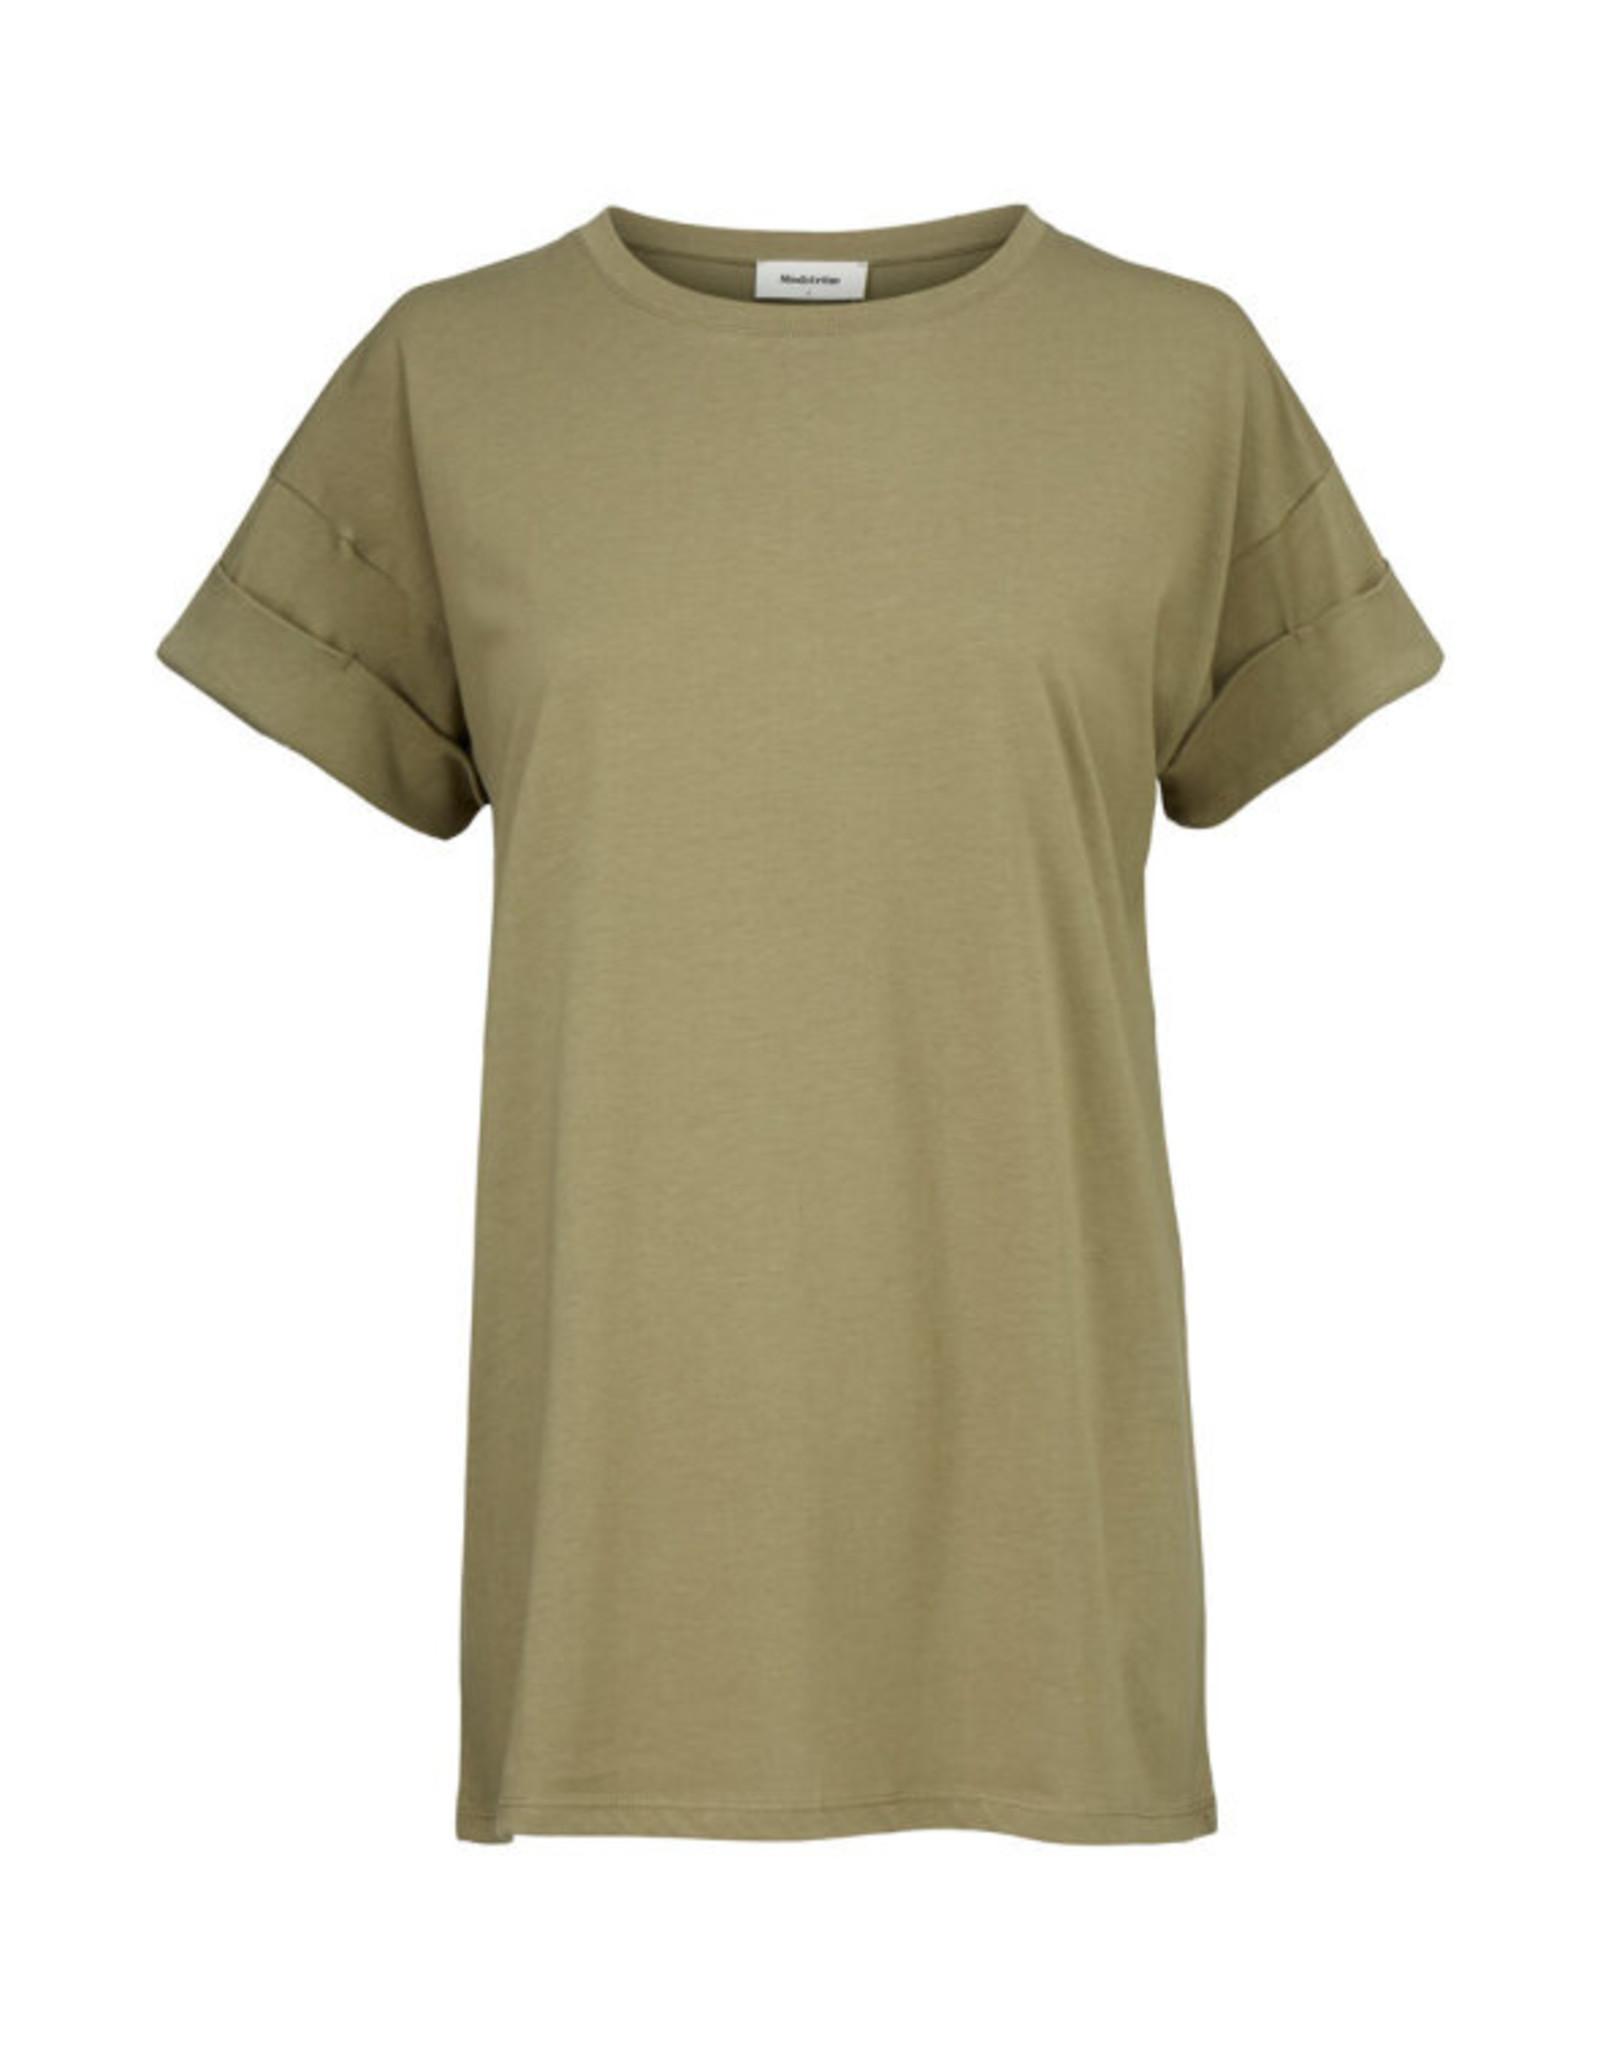 Modstrom Brazil T-Shirt Light Khaki